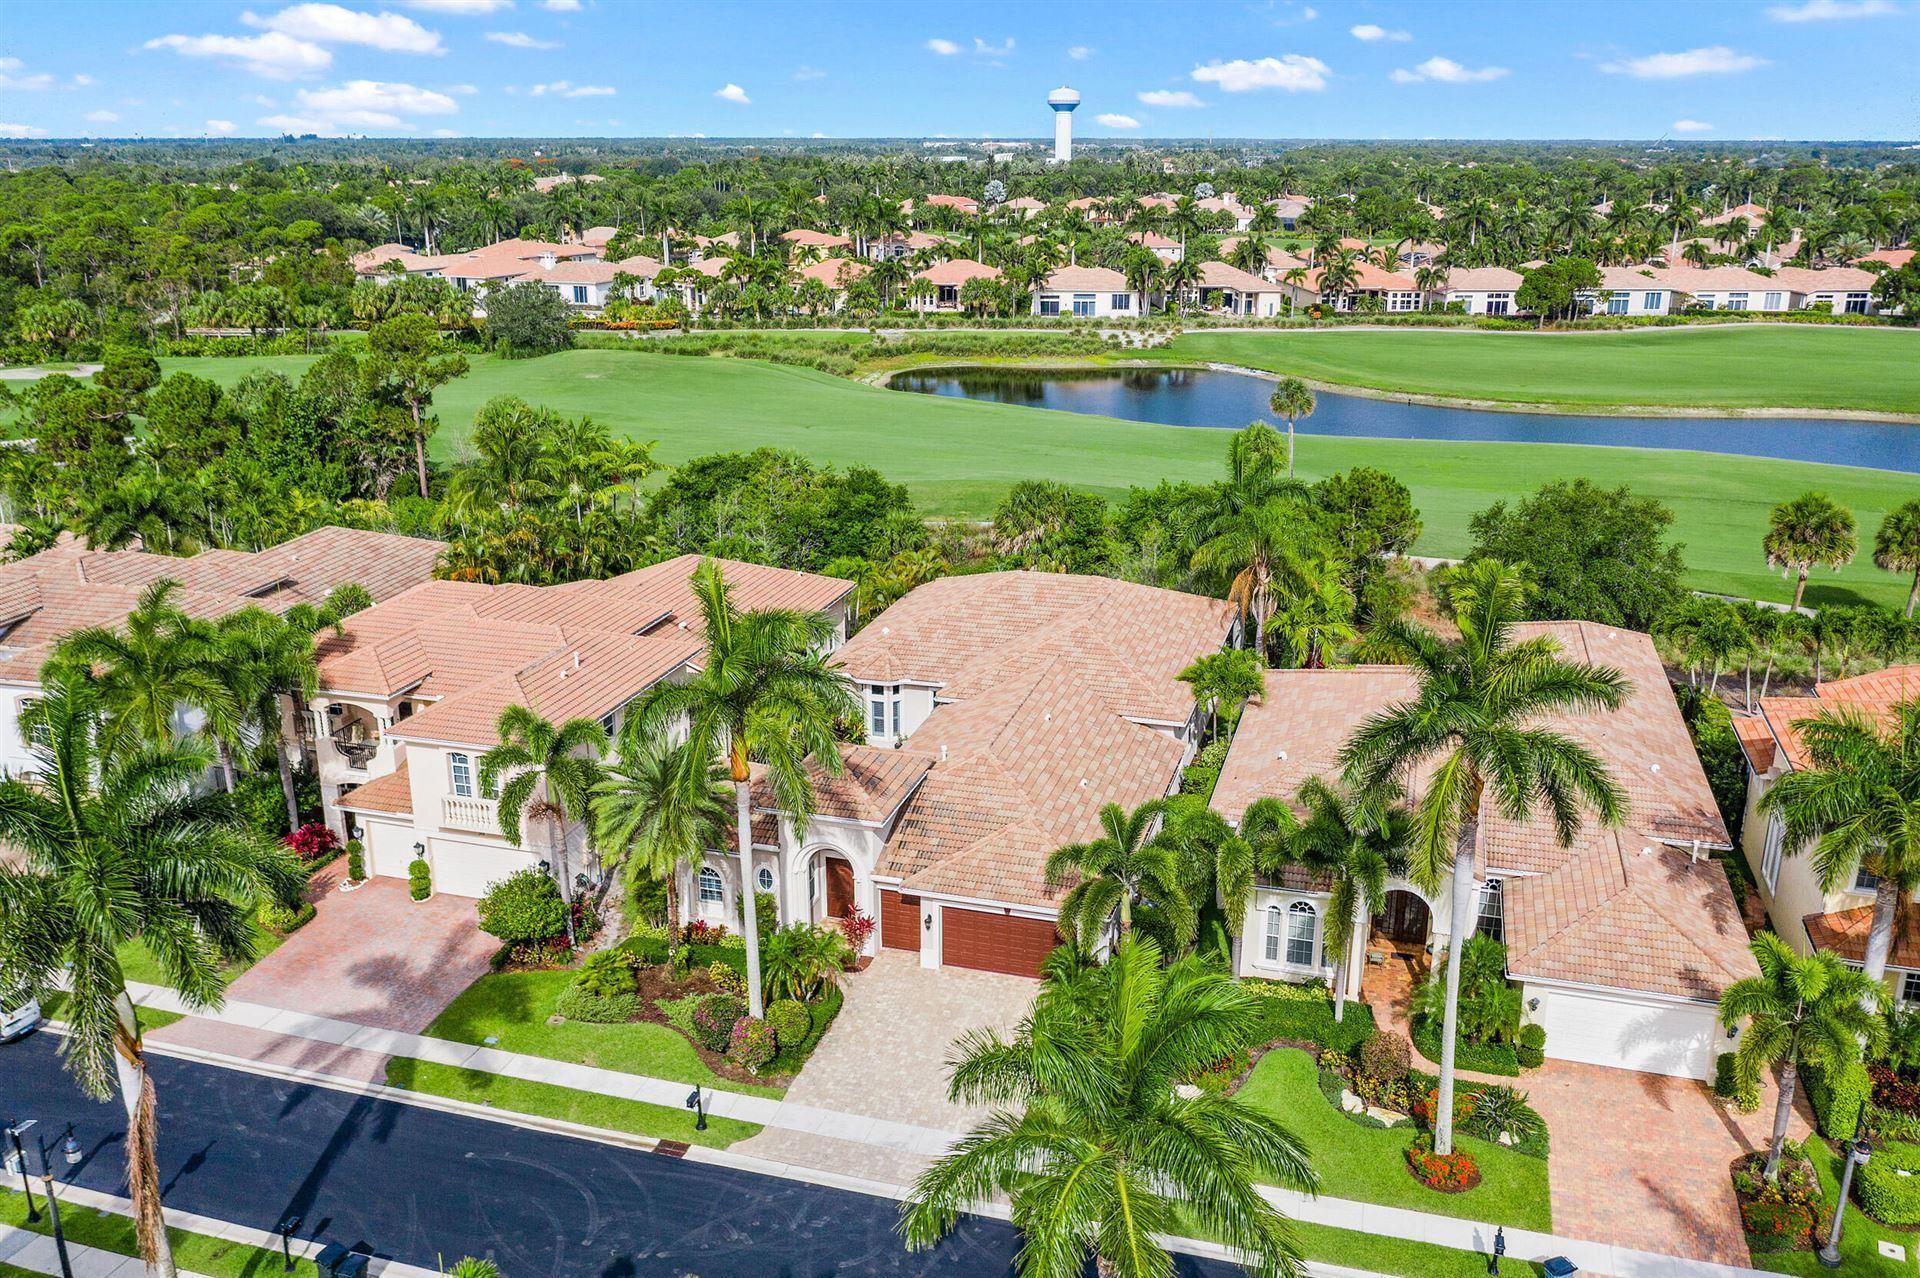 Photo of 321 Charroux Drive, Palm Beach Gardens, FL 33410 (MLS # RX-10724655)